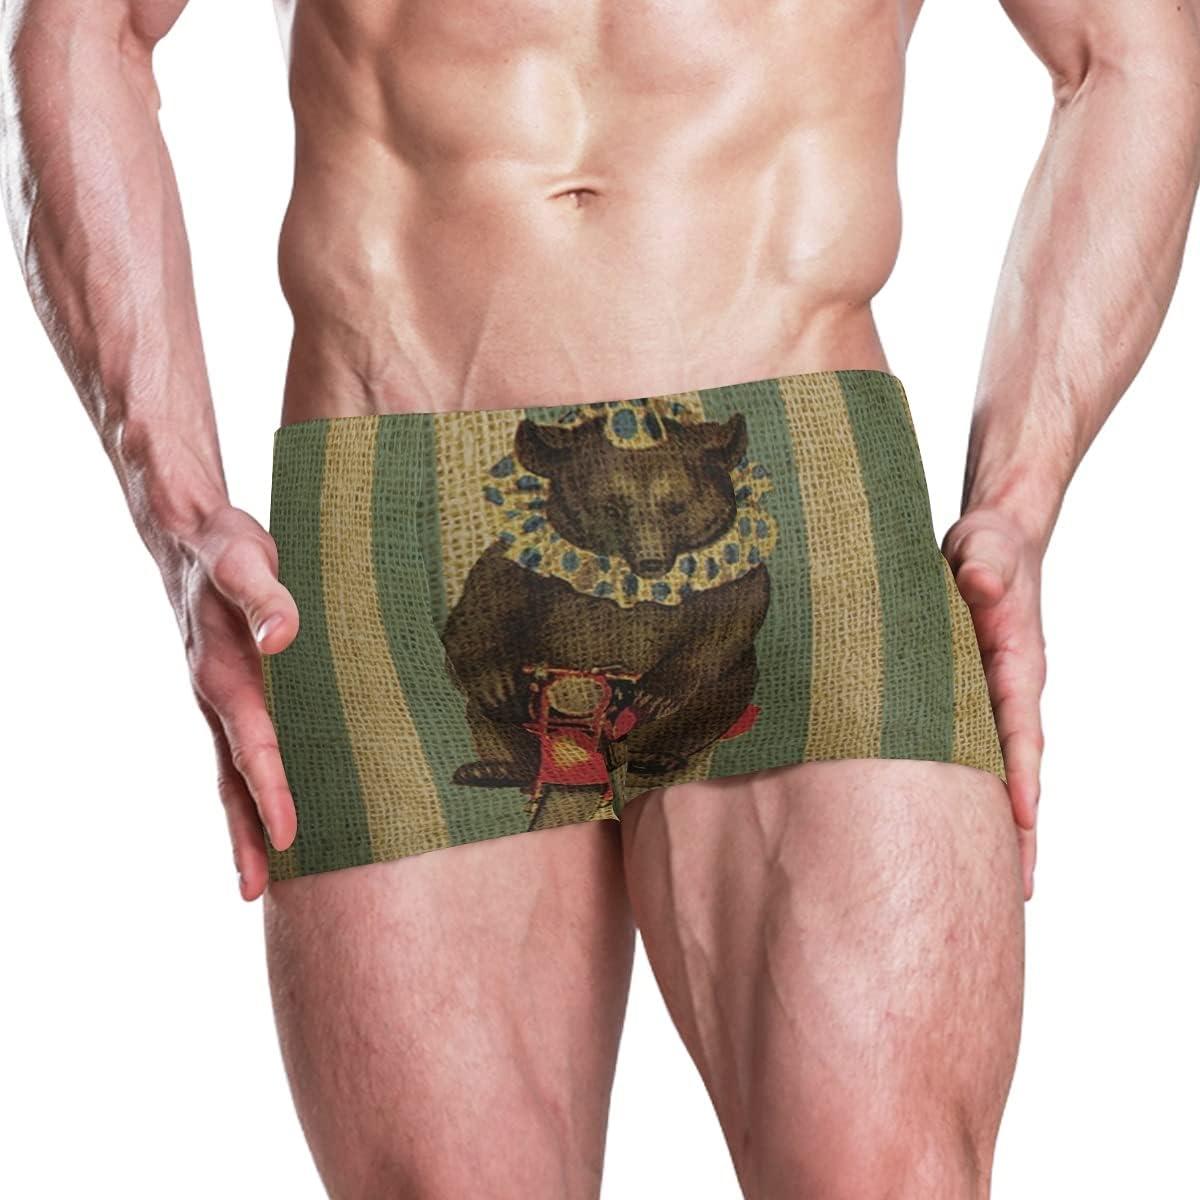 Boxer Swim Trunks Inexpensive for Men Cycle Bik Bath Swimsuit Max 49% OFF Bears Swimwear